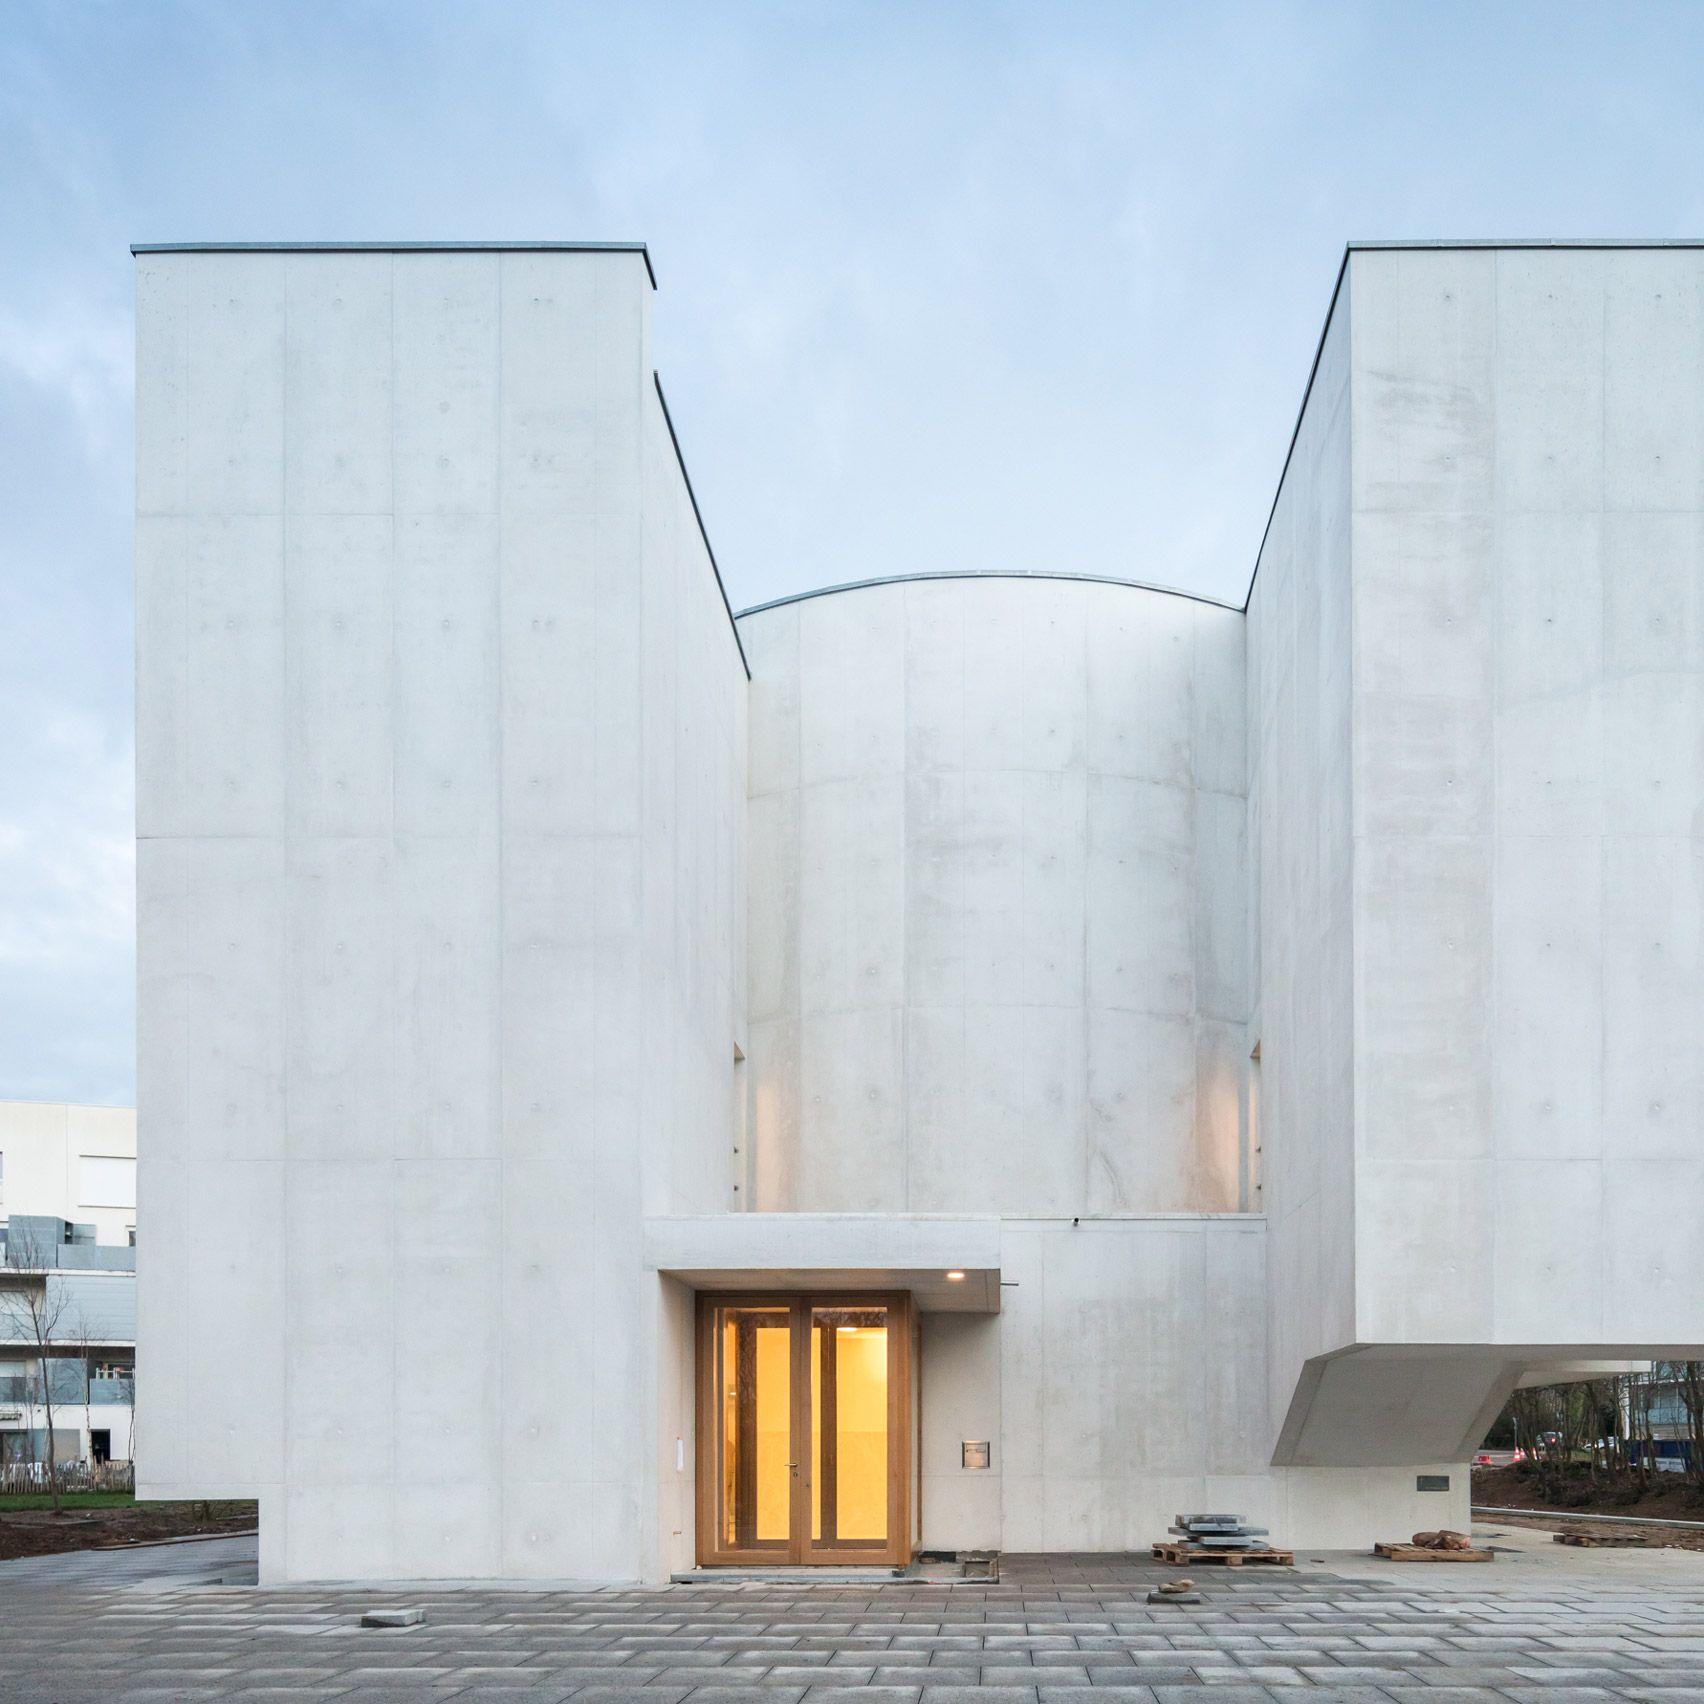 Portuguese Architect Alvaro Siza Vieira Has Completed A Church In The Brittany Region Of Fran Architecture En Beton Architecture Moderne Architecture De Facade